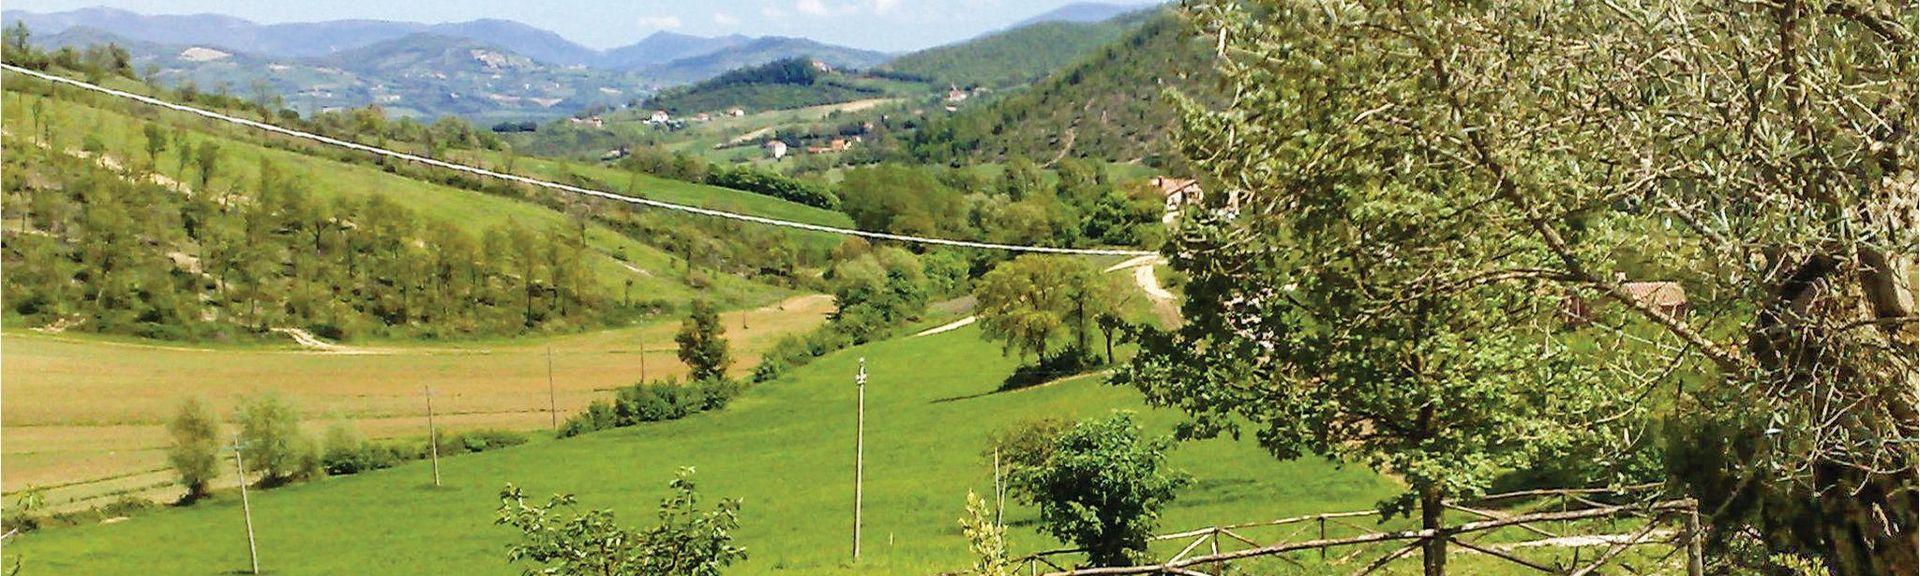 Cantiano, Pesaro and Urbino, Marche, Italy